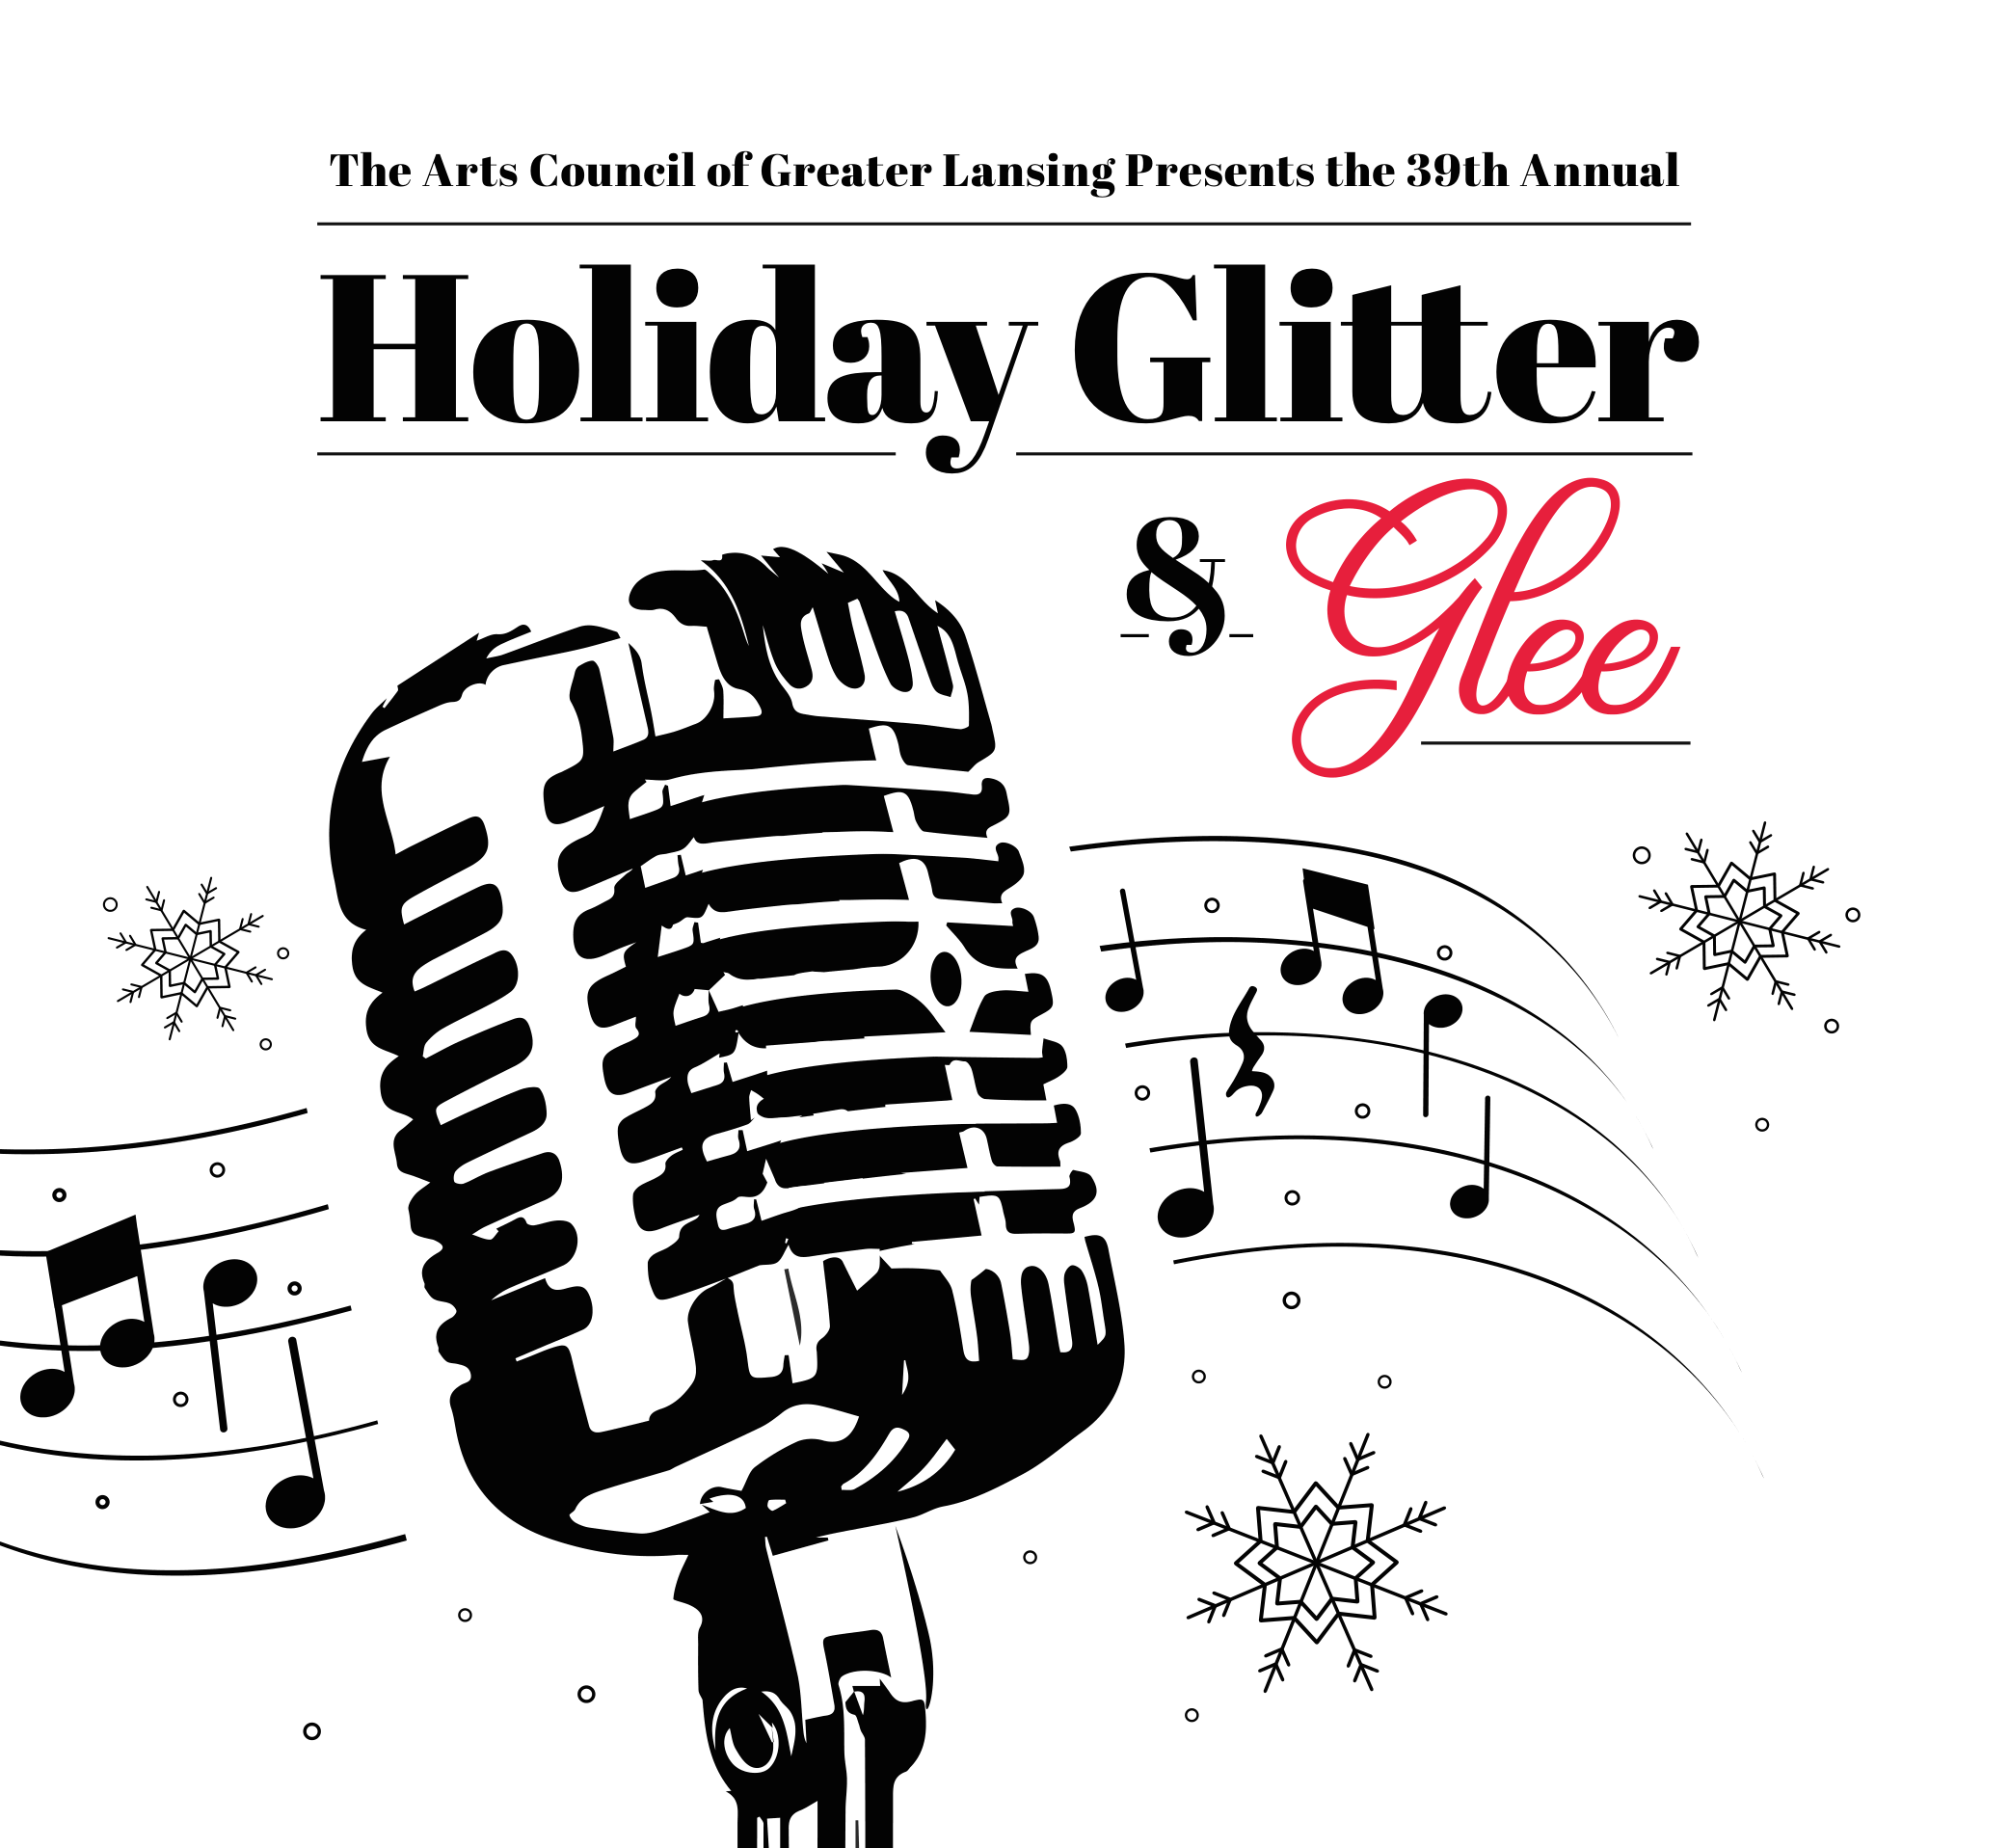 Holiday Glitter & Glee